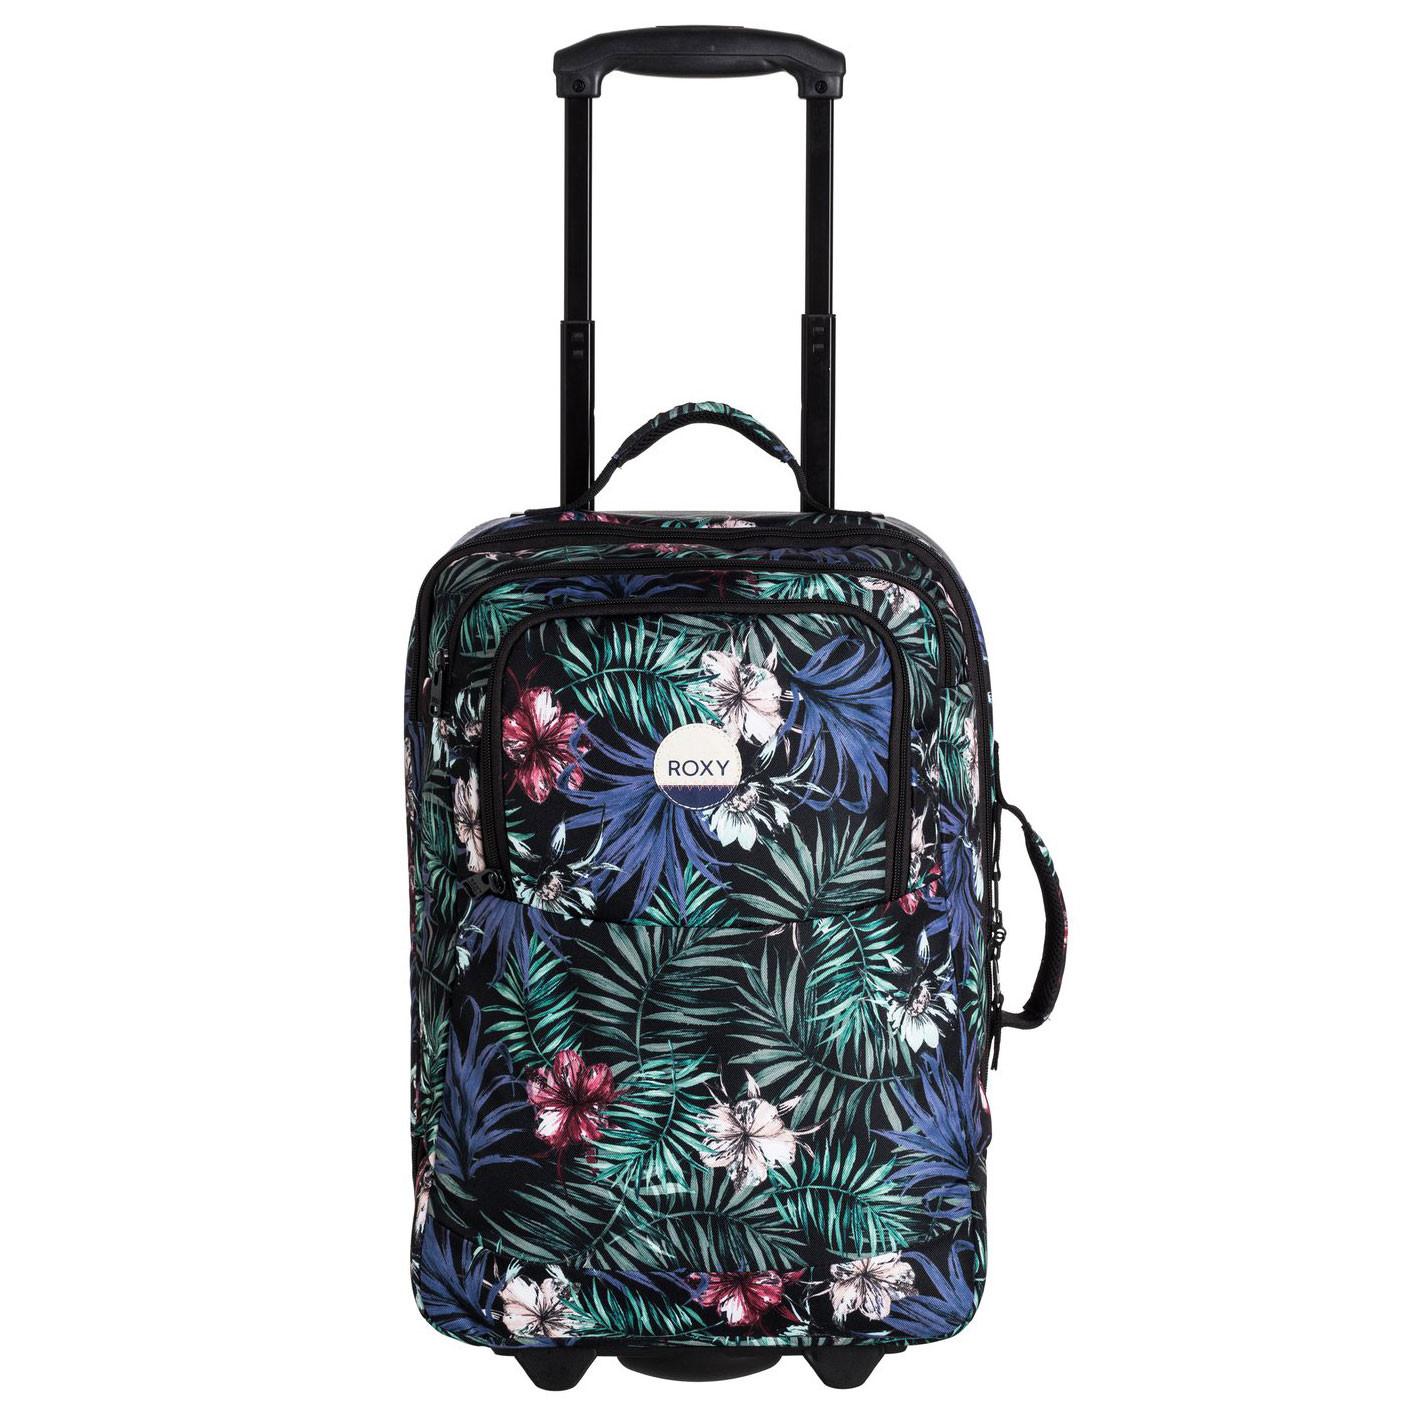 Cestovní taška Roxy Wheelie anthracite swim belharra flowe